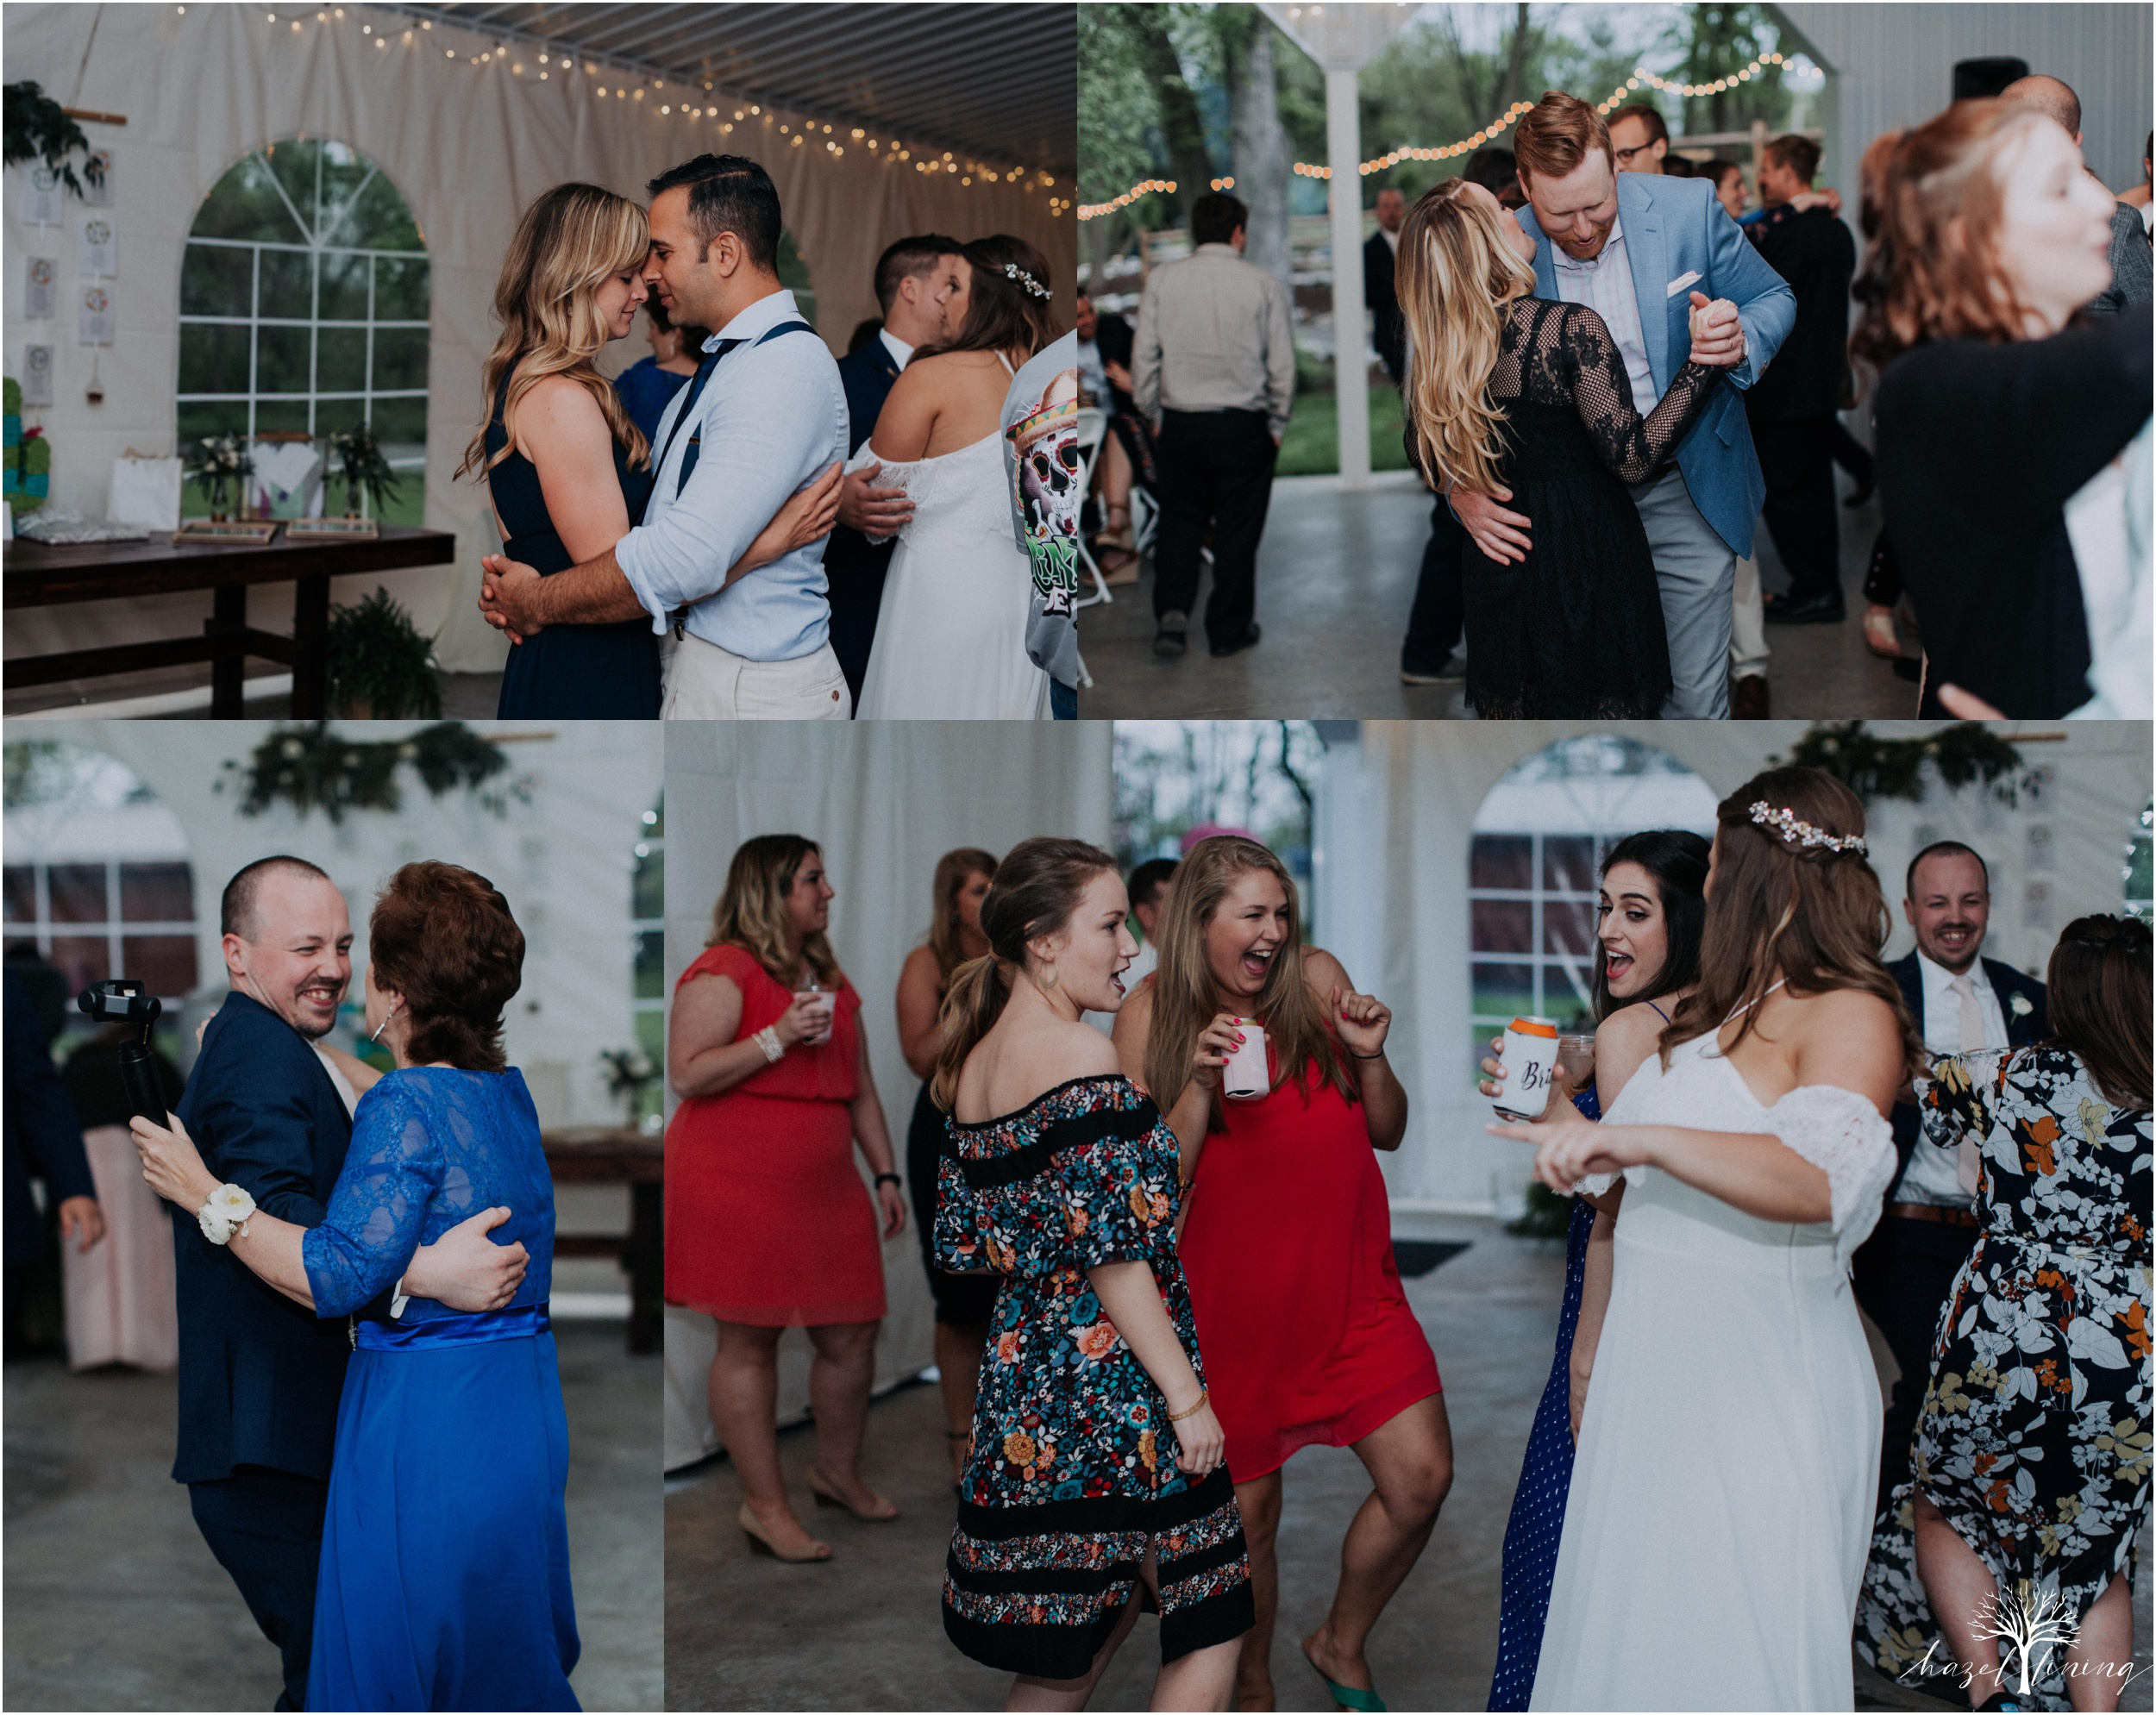 hazel-lining-travel-wedding-elopement-photography-abby-skyler-hunt-the-willis-house-york-pennsylvania-outdoor-estate-wedding_0145.jpg